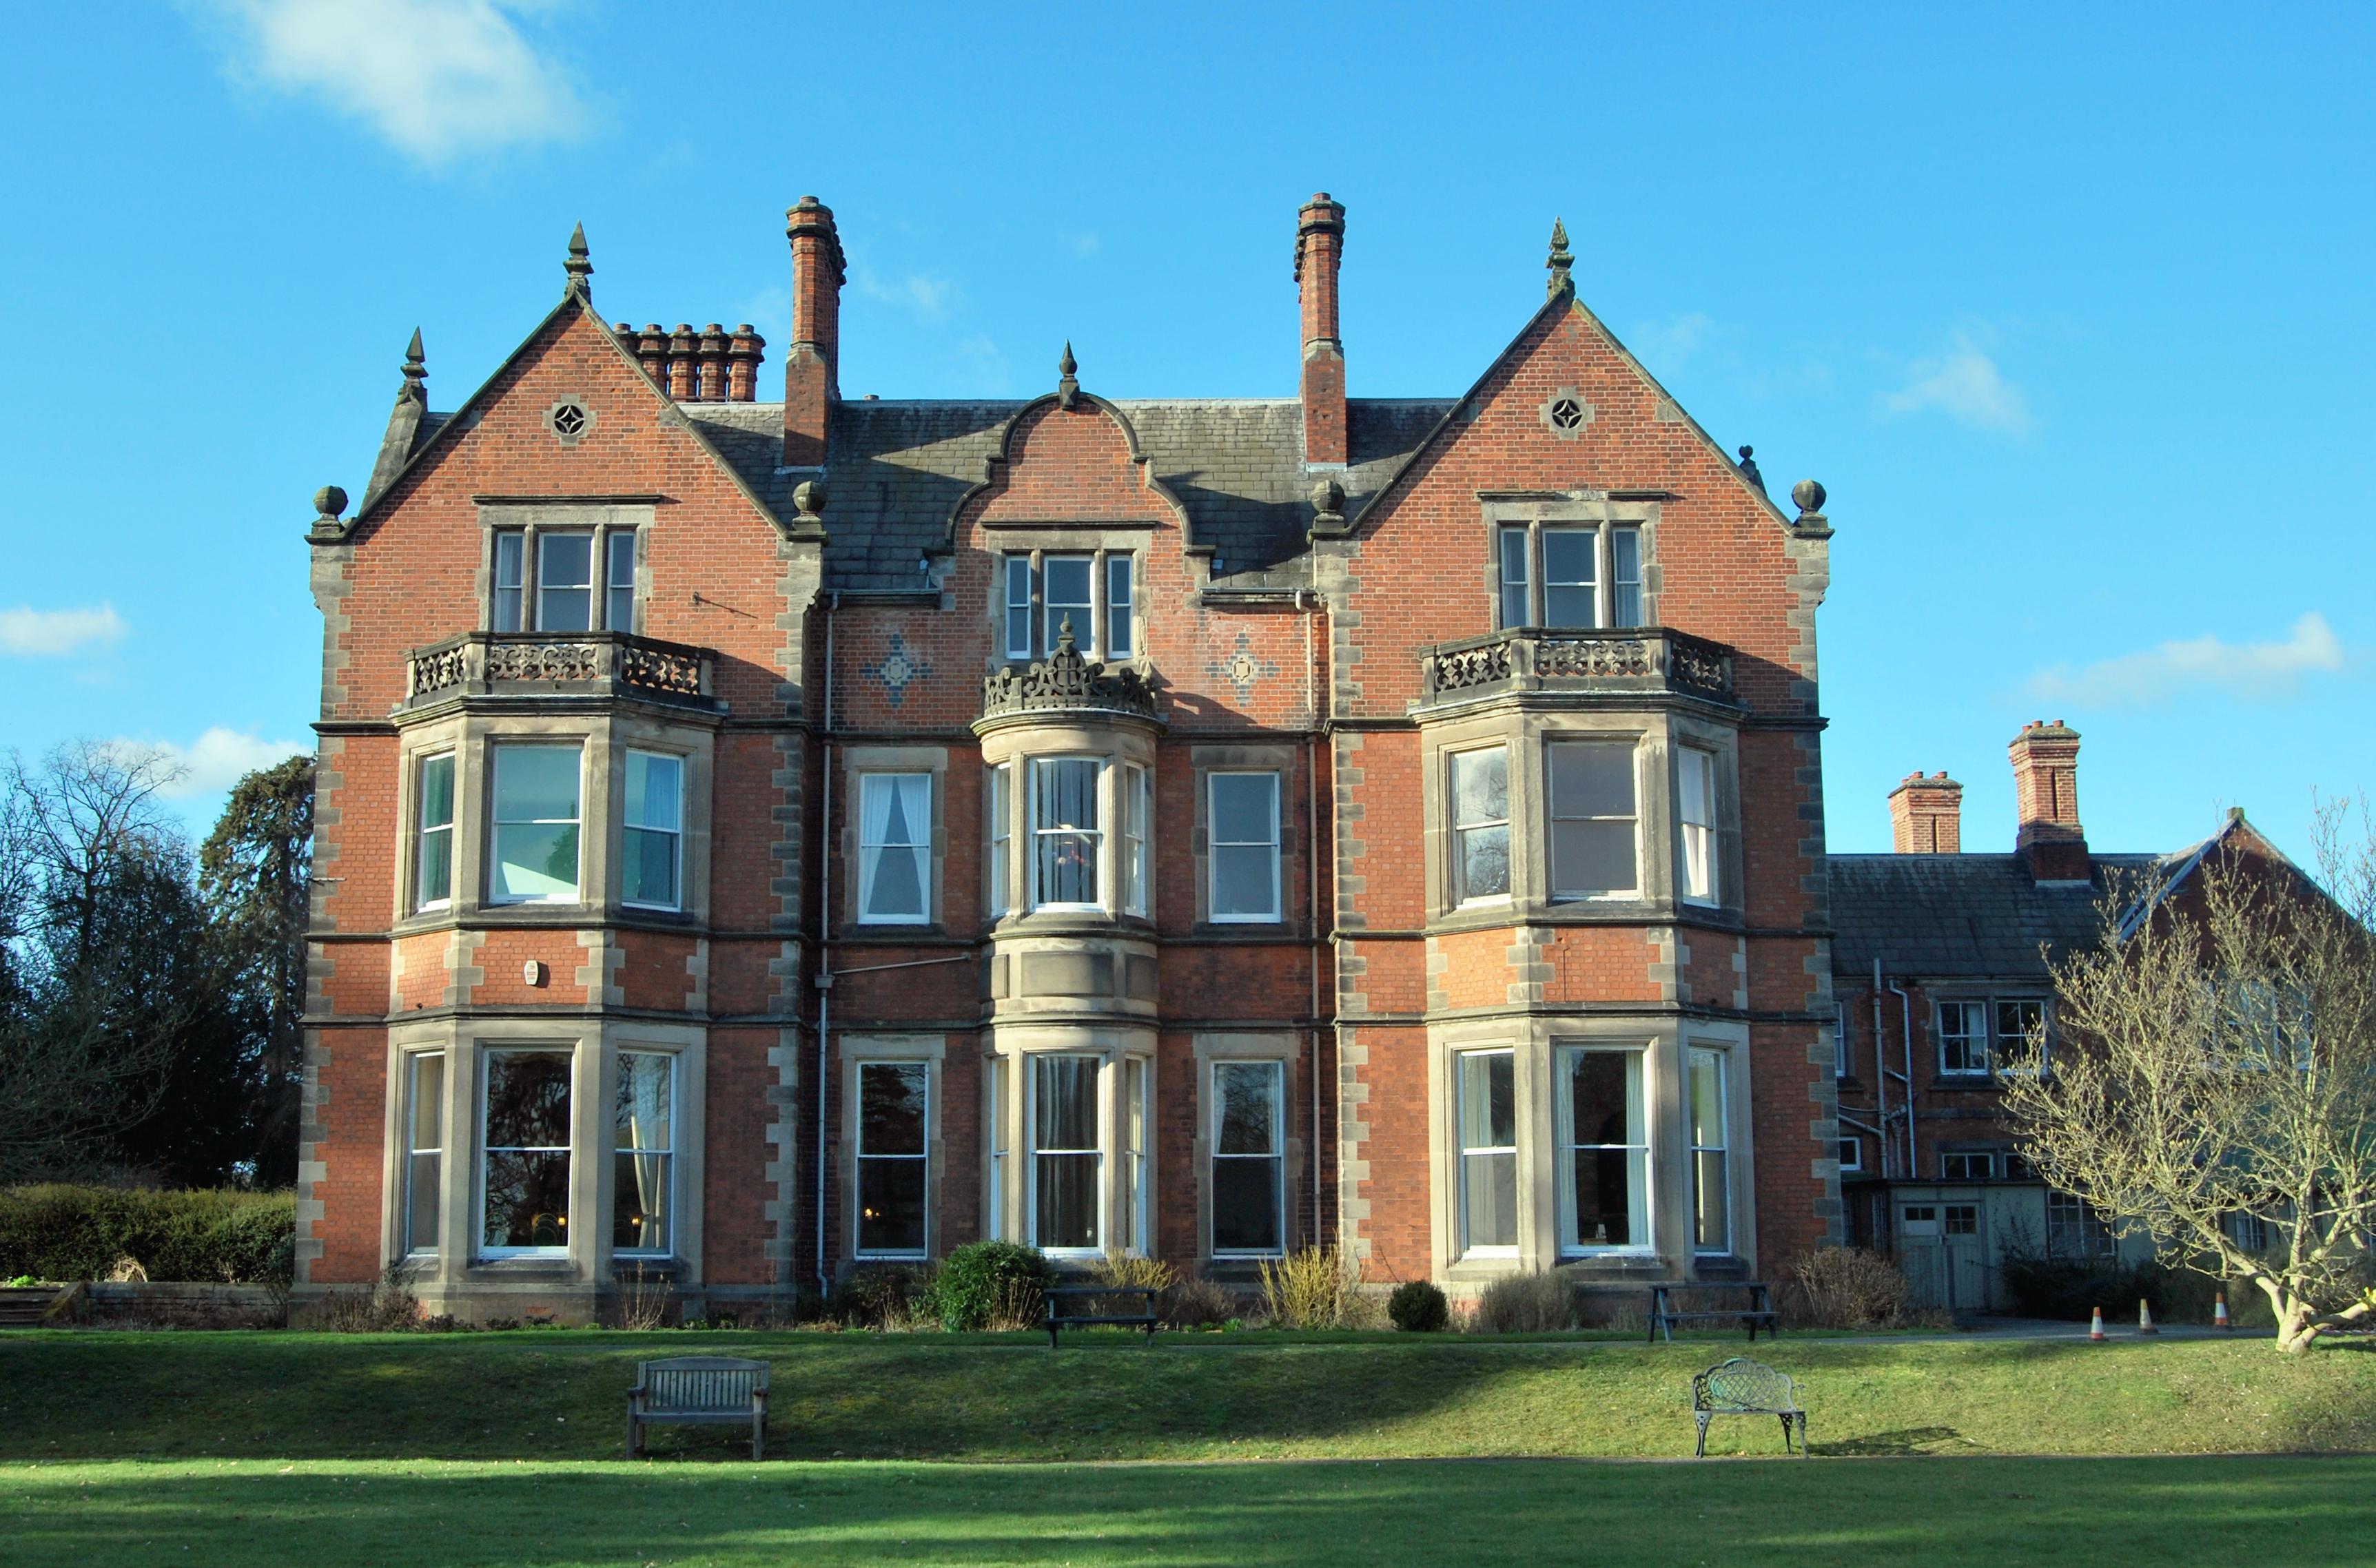 File:Ashe Hall, Derbyshire, South Aspect.JPG - Wikimedia ...